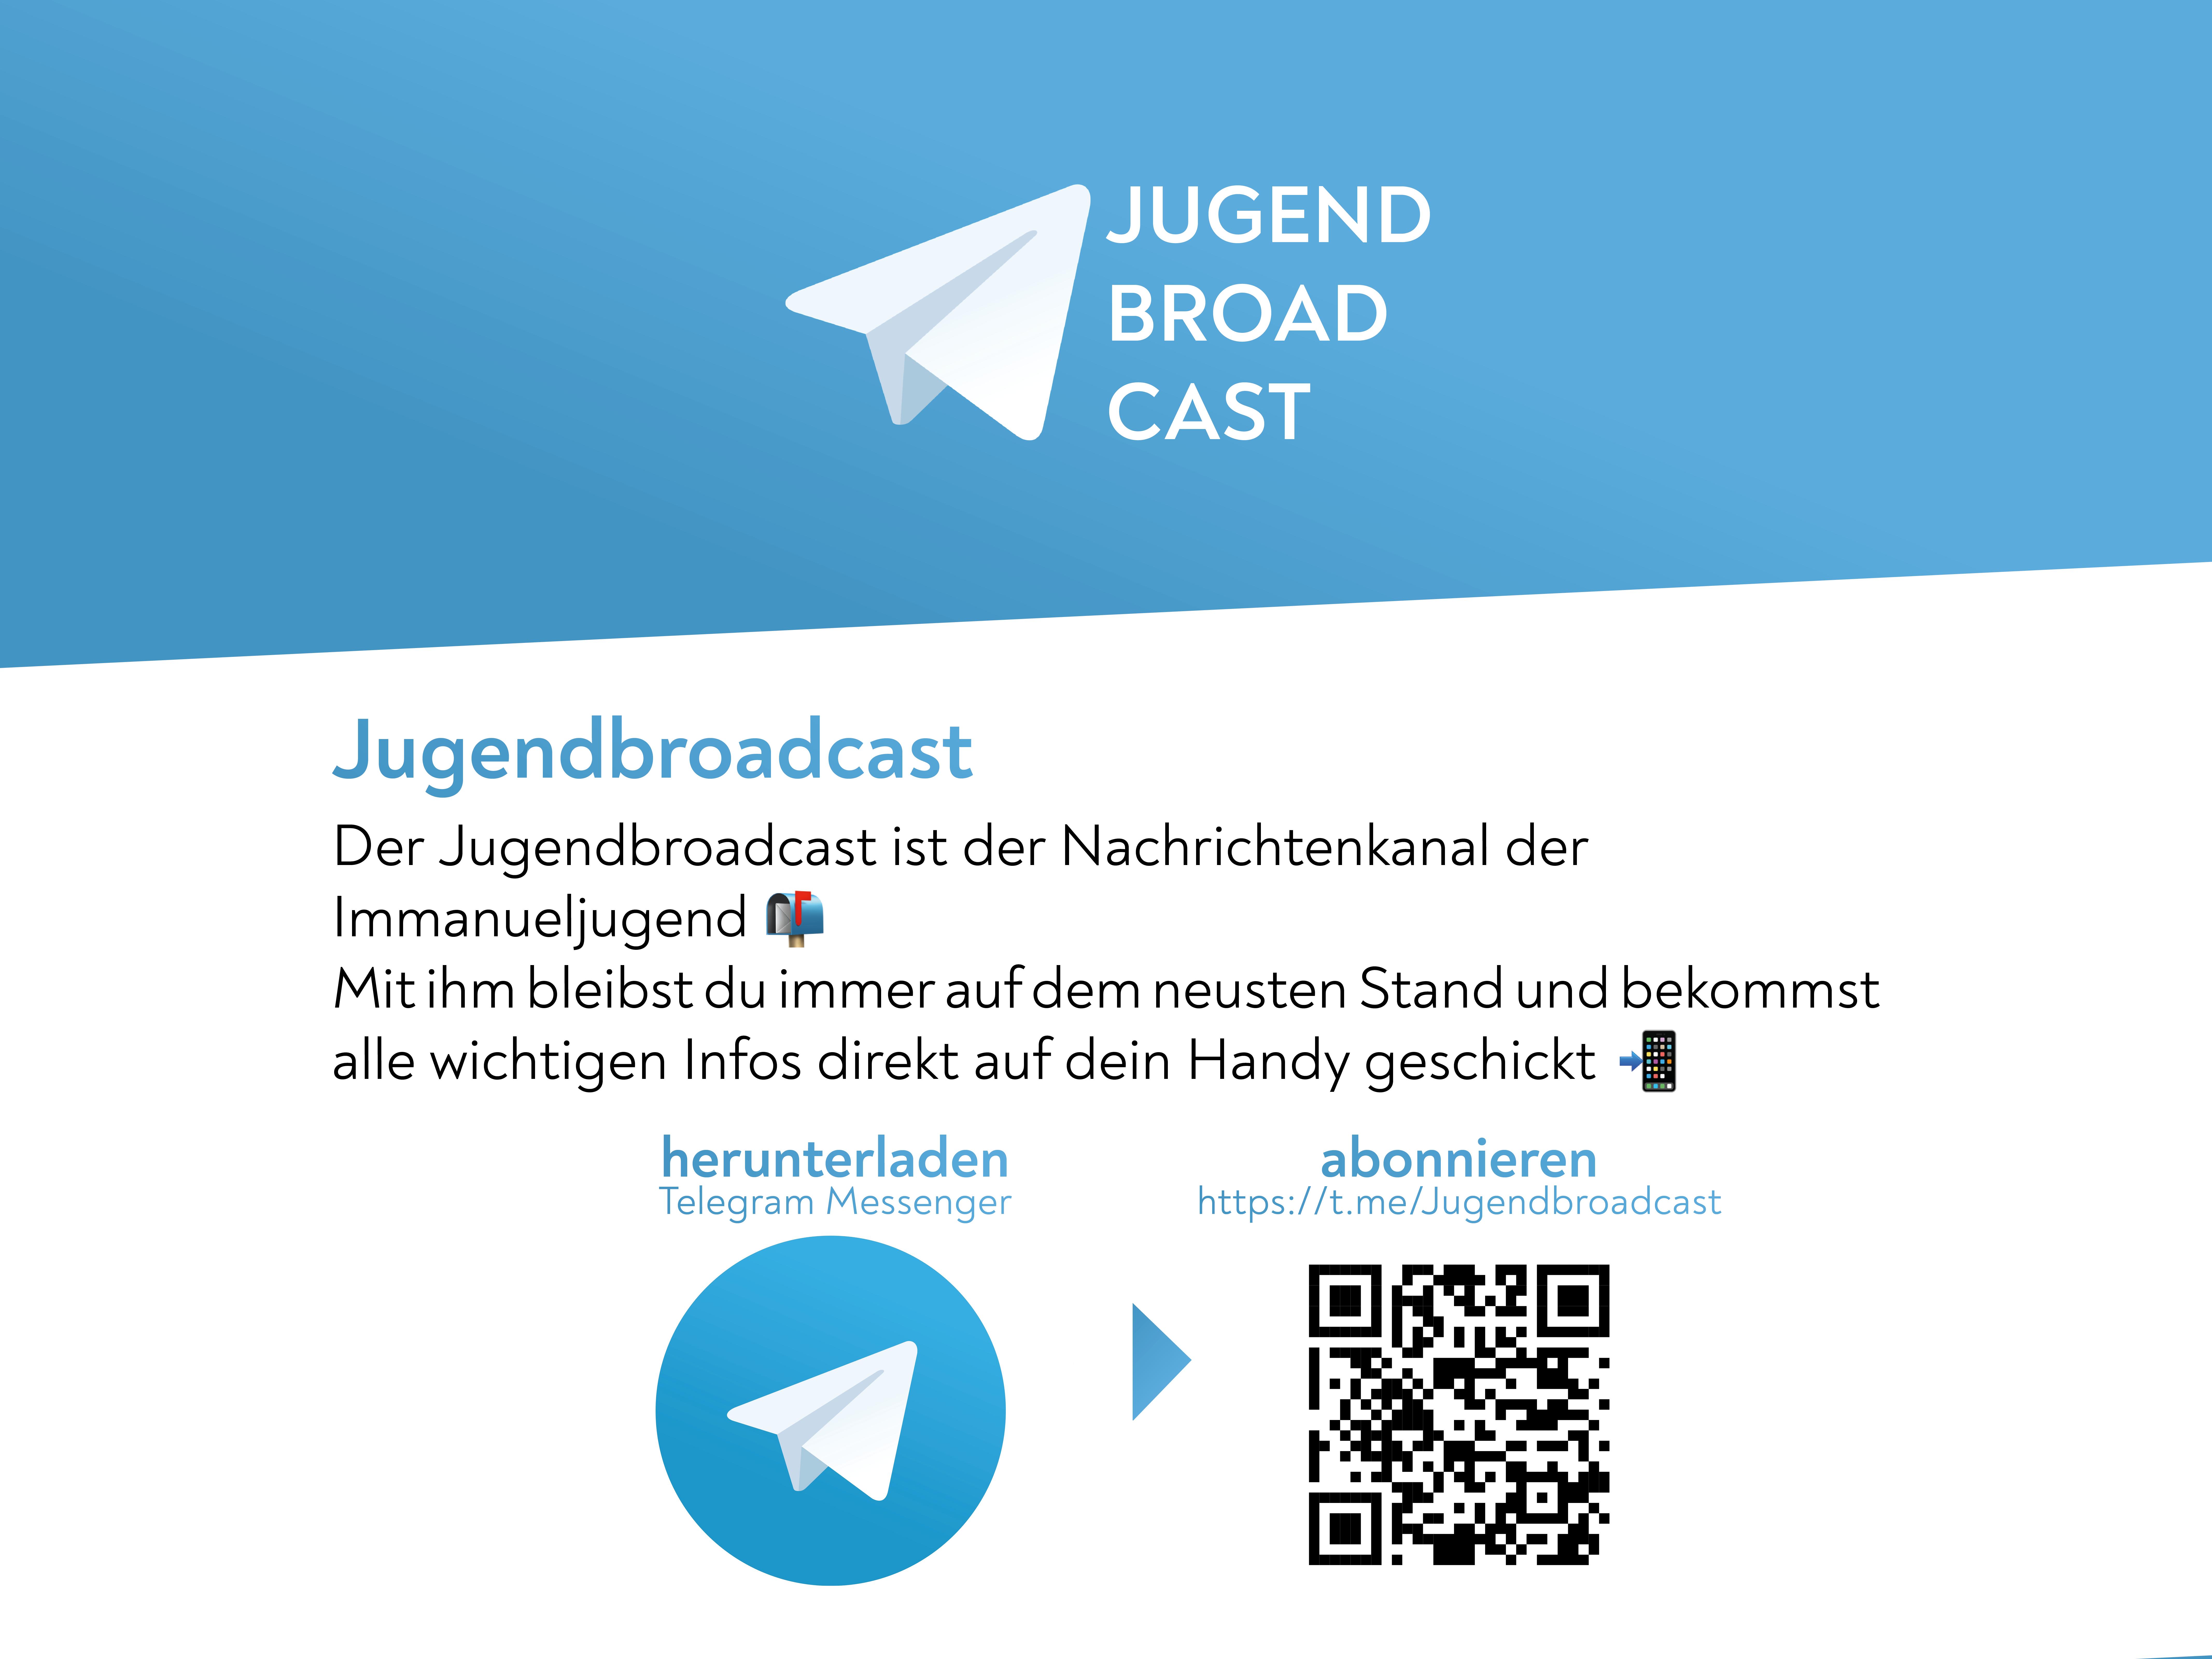 Jugendbroadcast